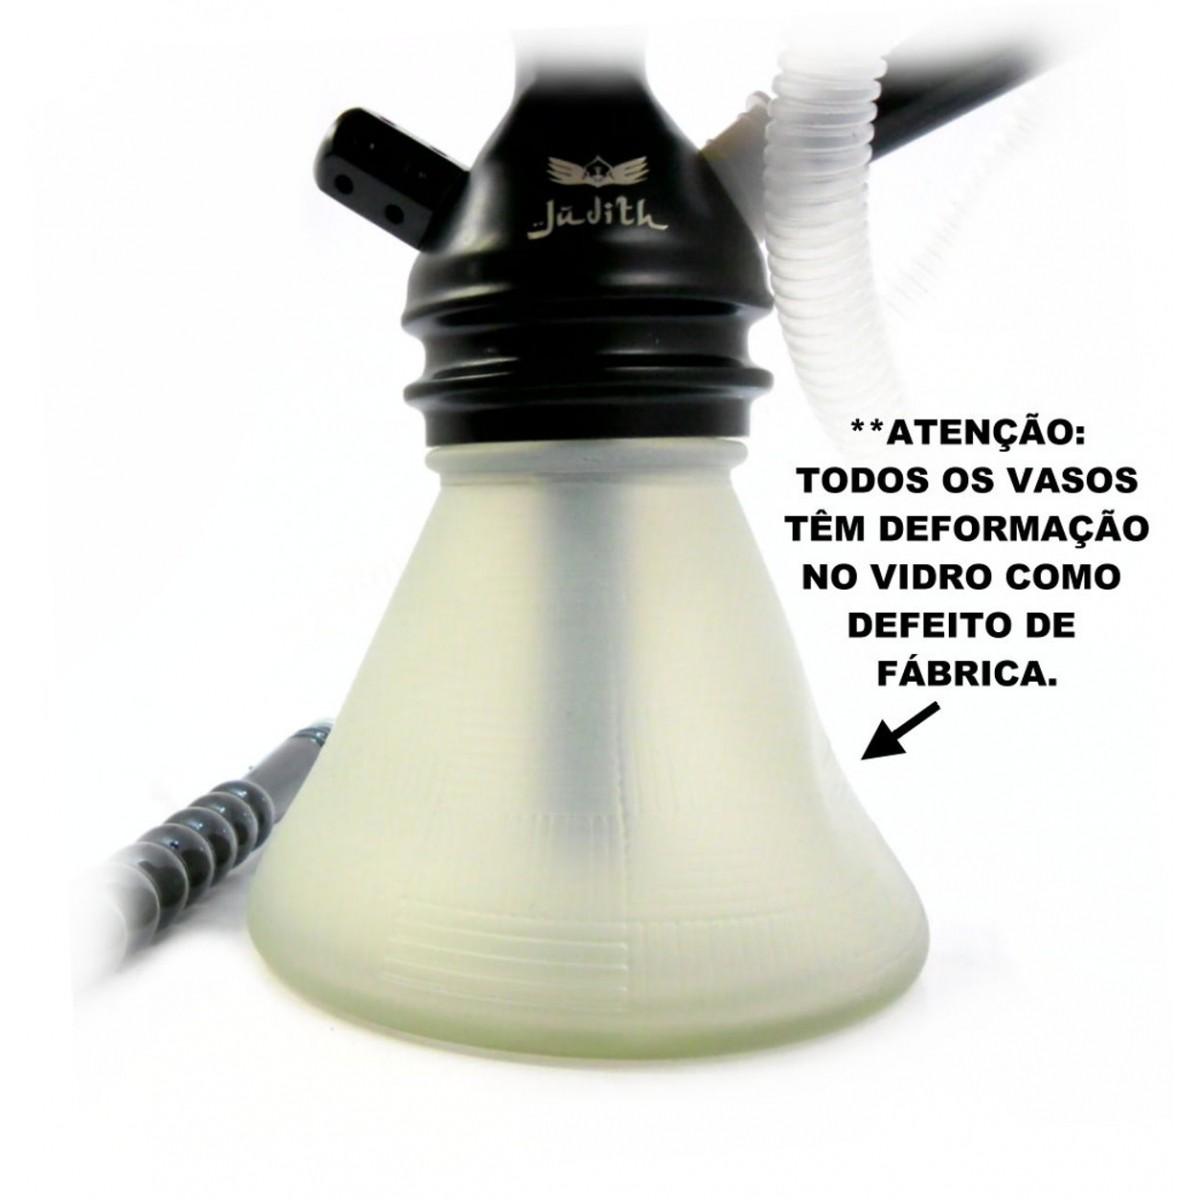 Narguile JUDITH POLIDO 33cm, vaso Petit BRANCO, mangueira MD HOSE Vermelha, fornilho MD Verm, prato Vennus Branco/Crom